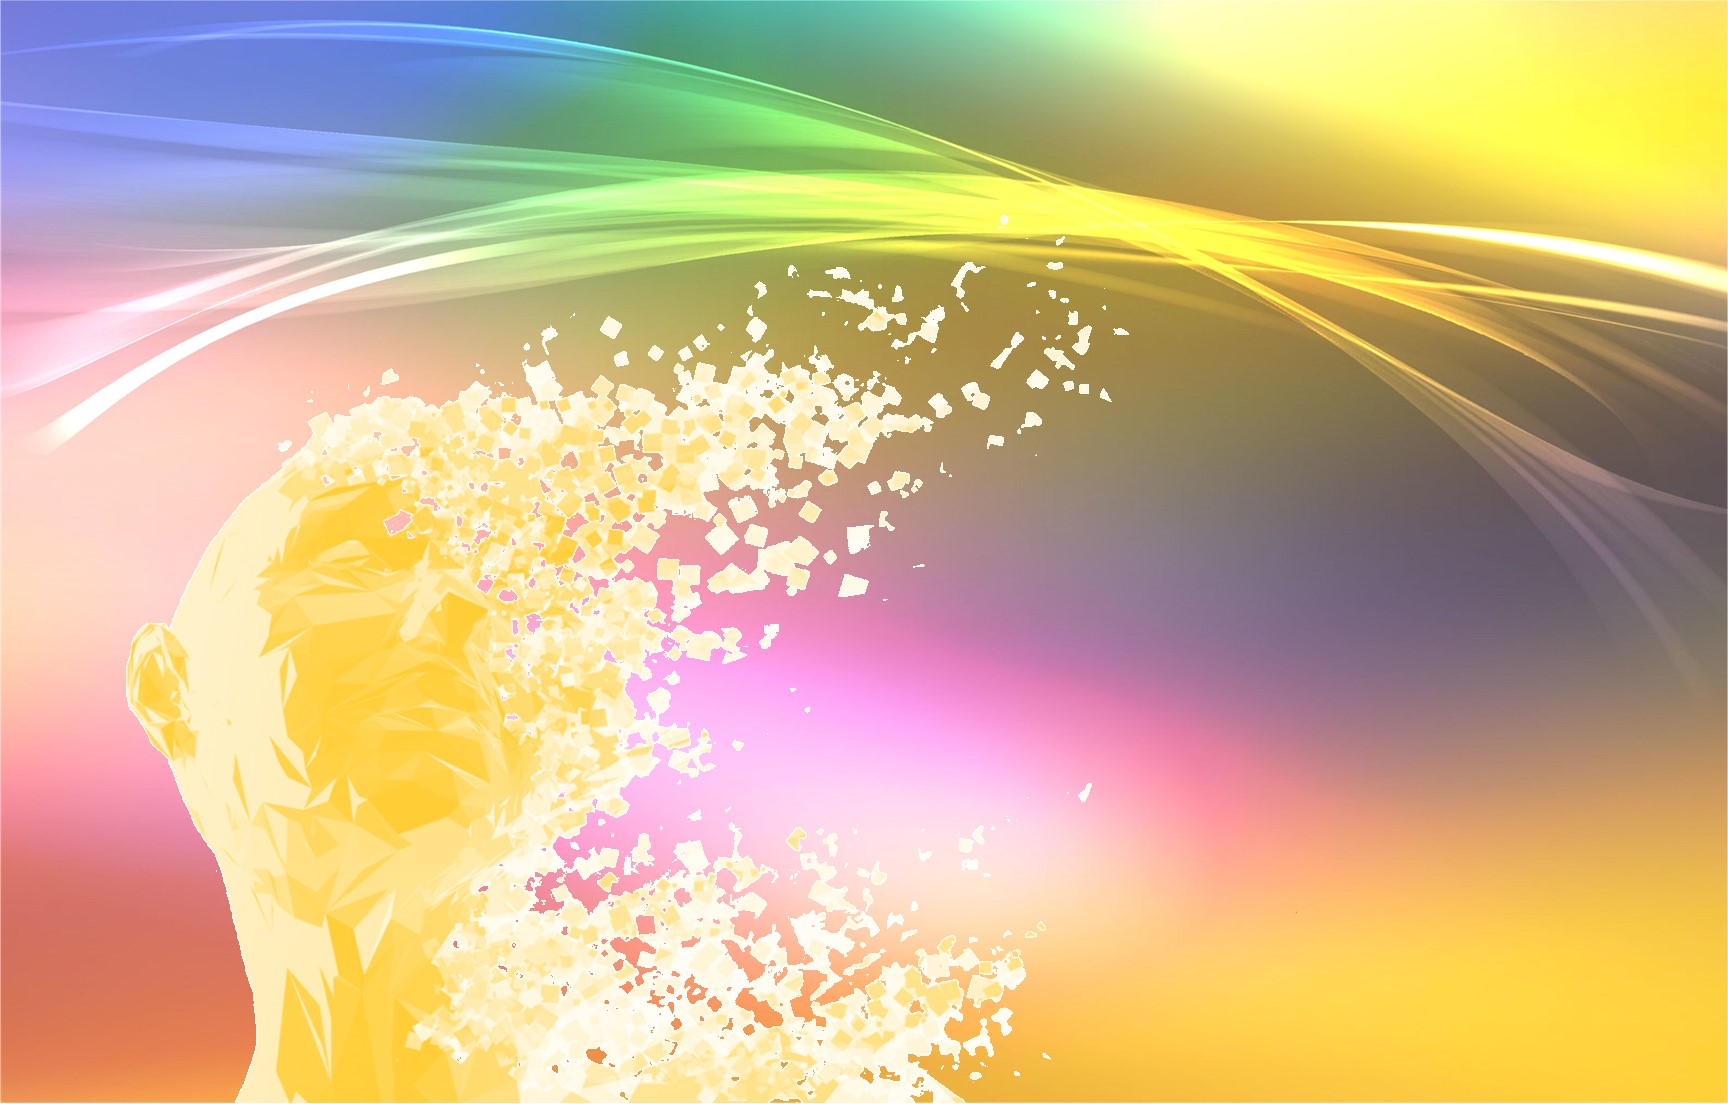 Scintilla, Medicina Naturale Vibrazionale, Evoluzione Personale, Coaching, Floriterapia, Sound Healing, Light Energy Healing,